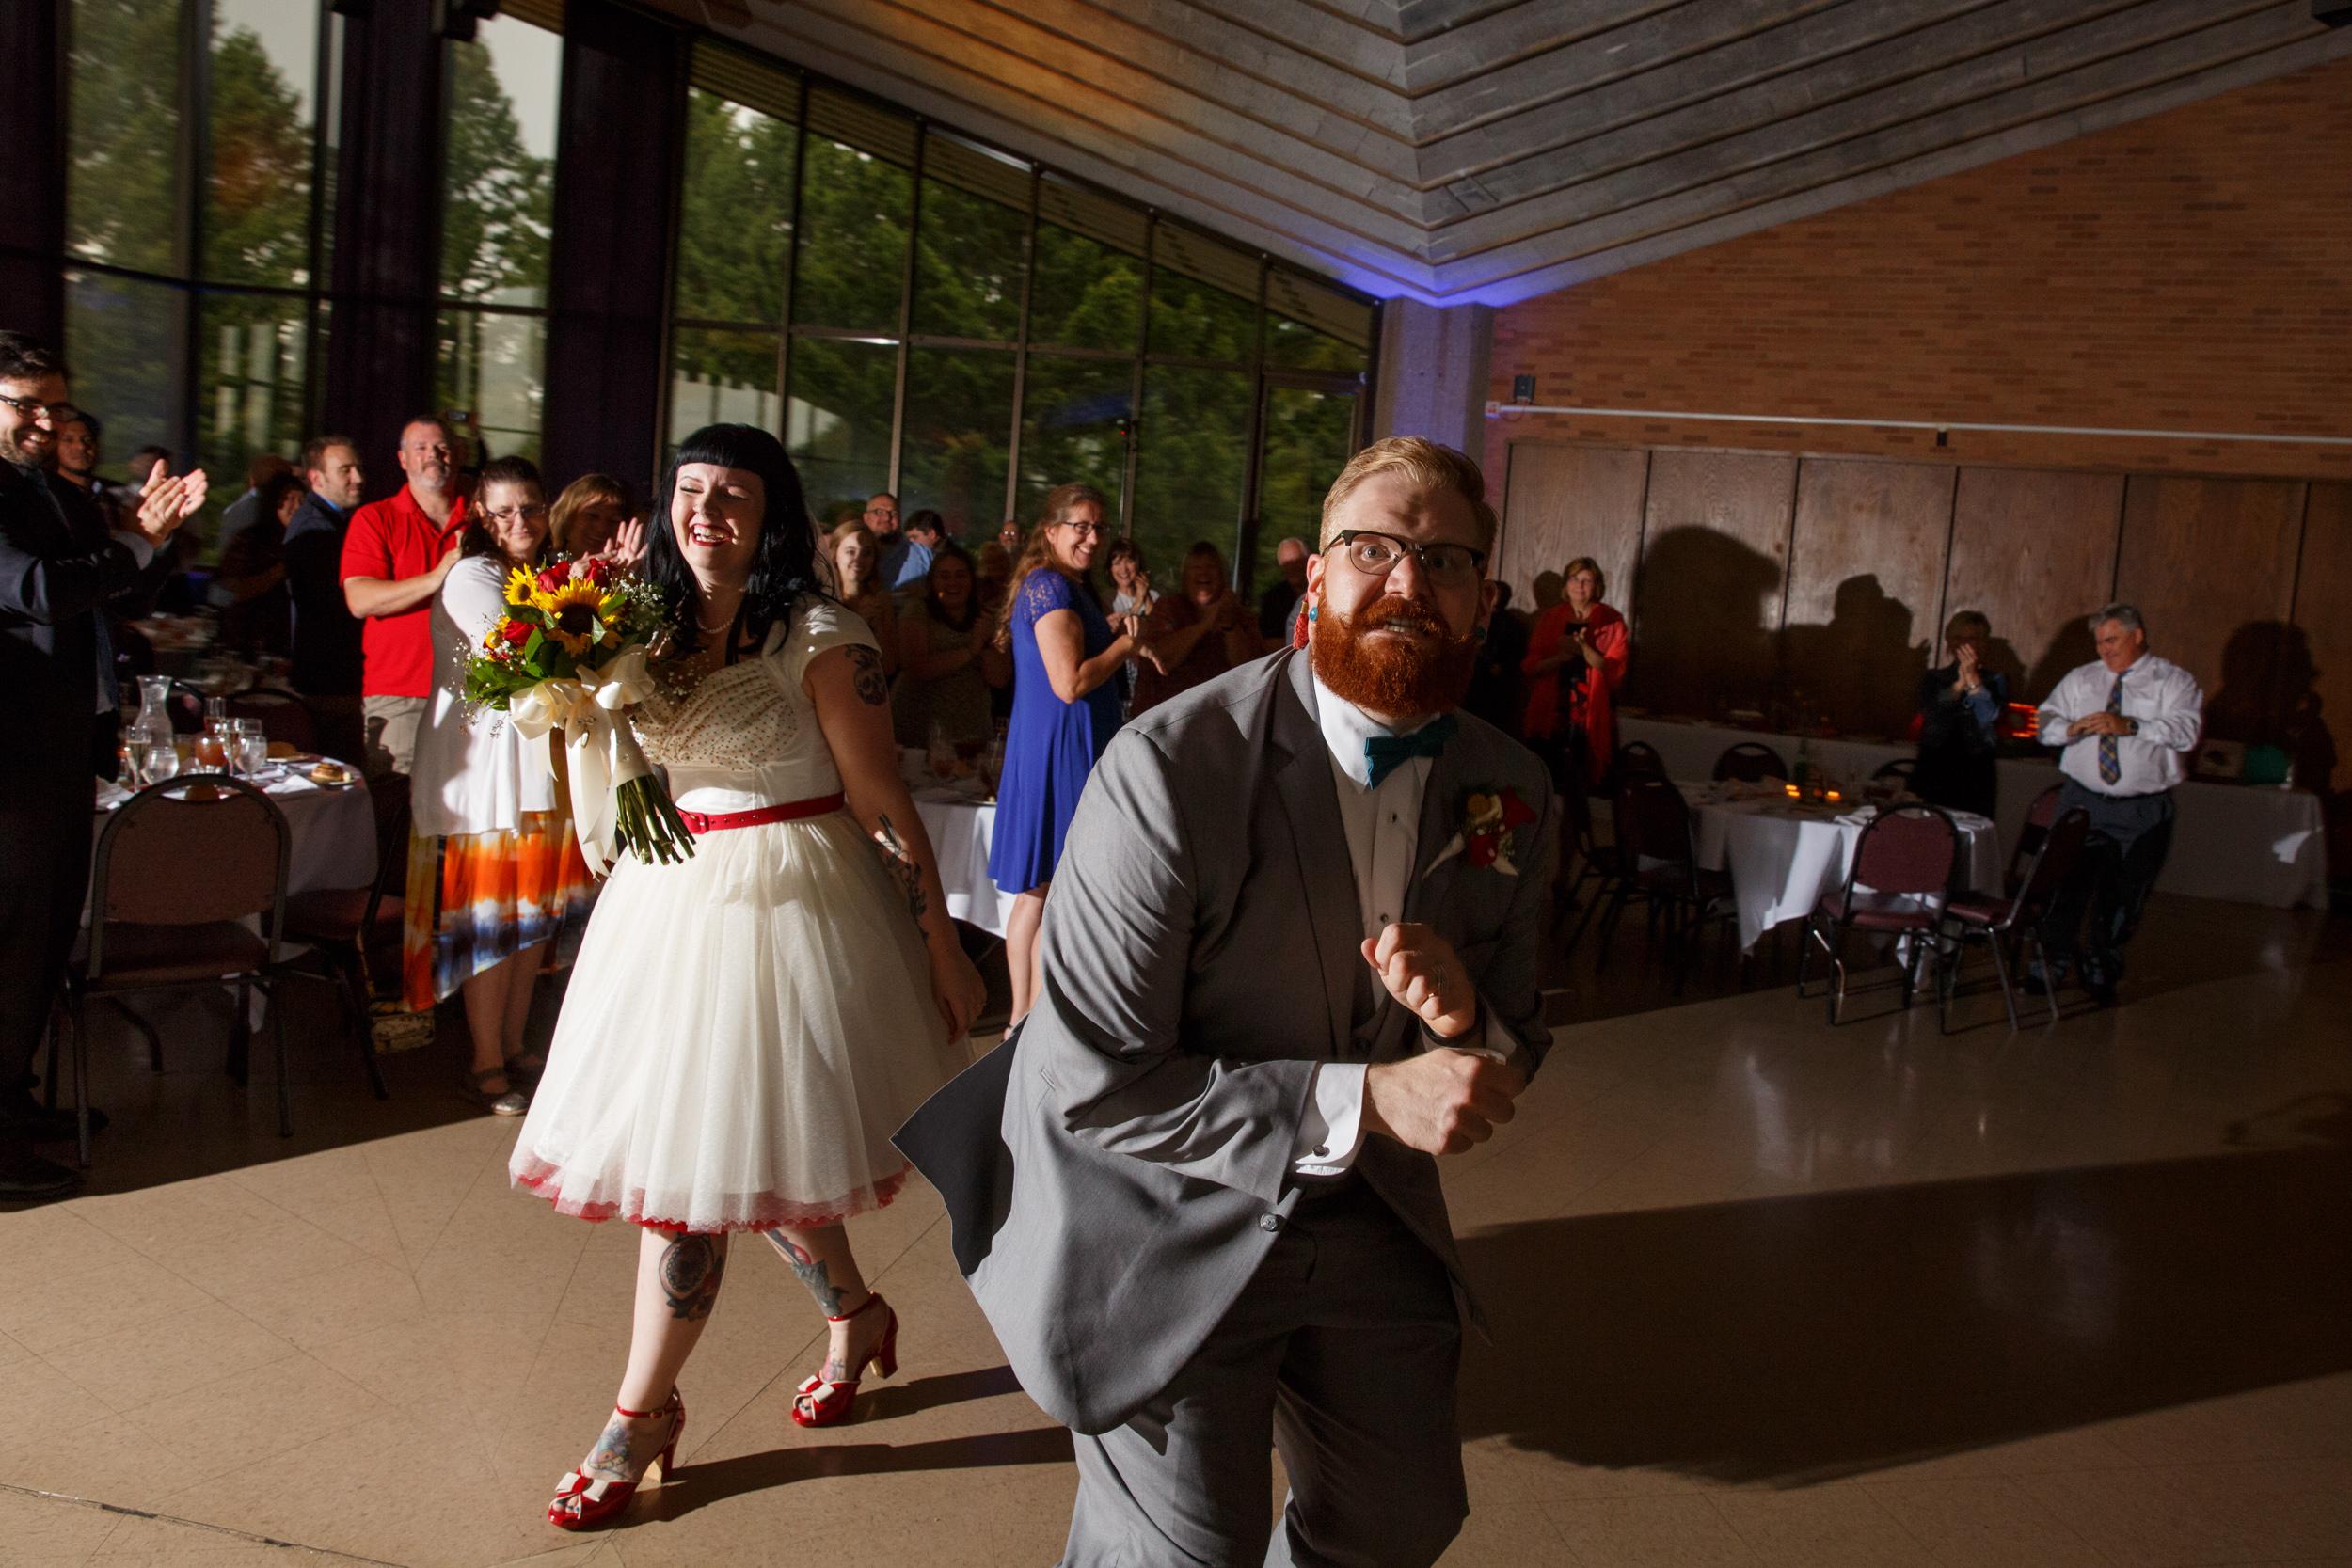 Christian & Sarah wedding photography by Brian milo-222.jpg